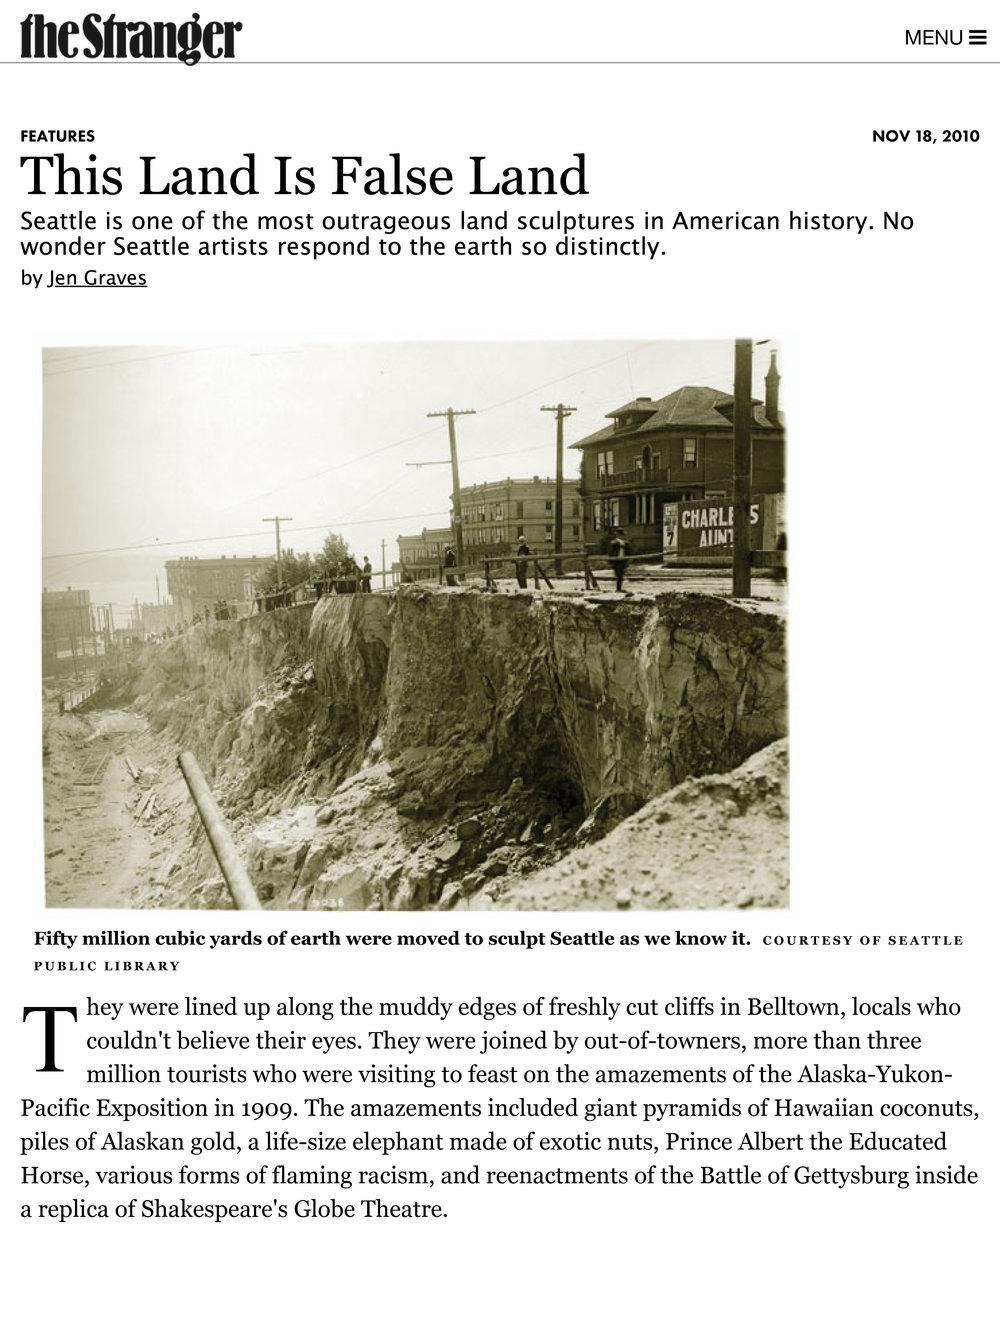 This Land Is False Land-1.jpg